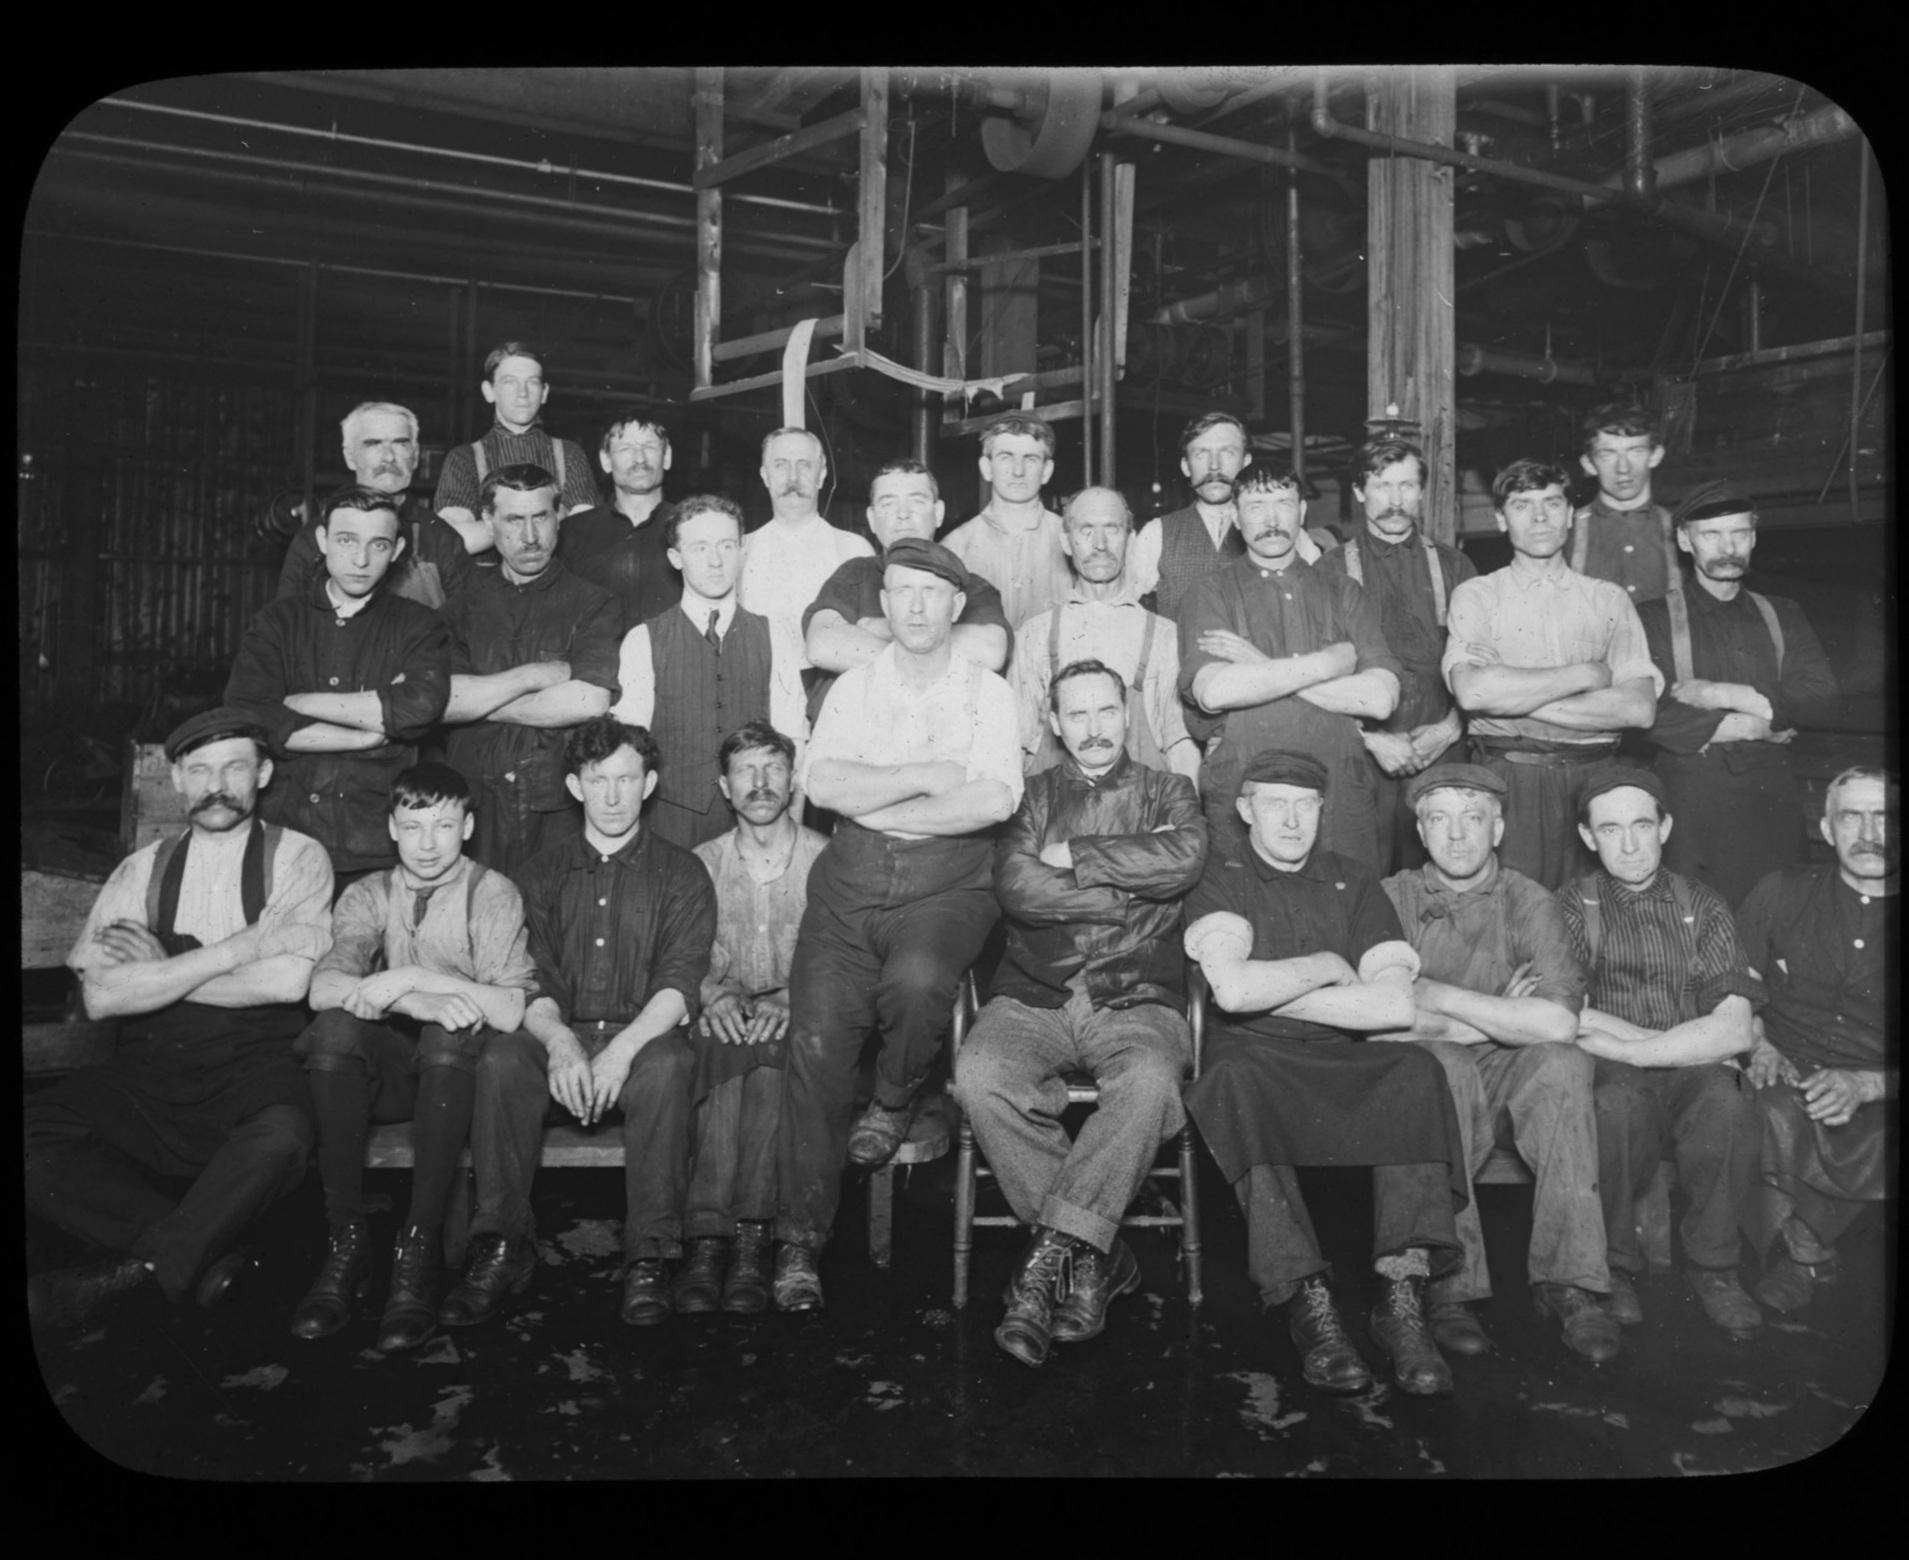 Dye House group, 1912, Lawrence, MA